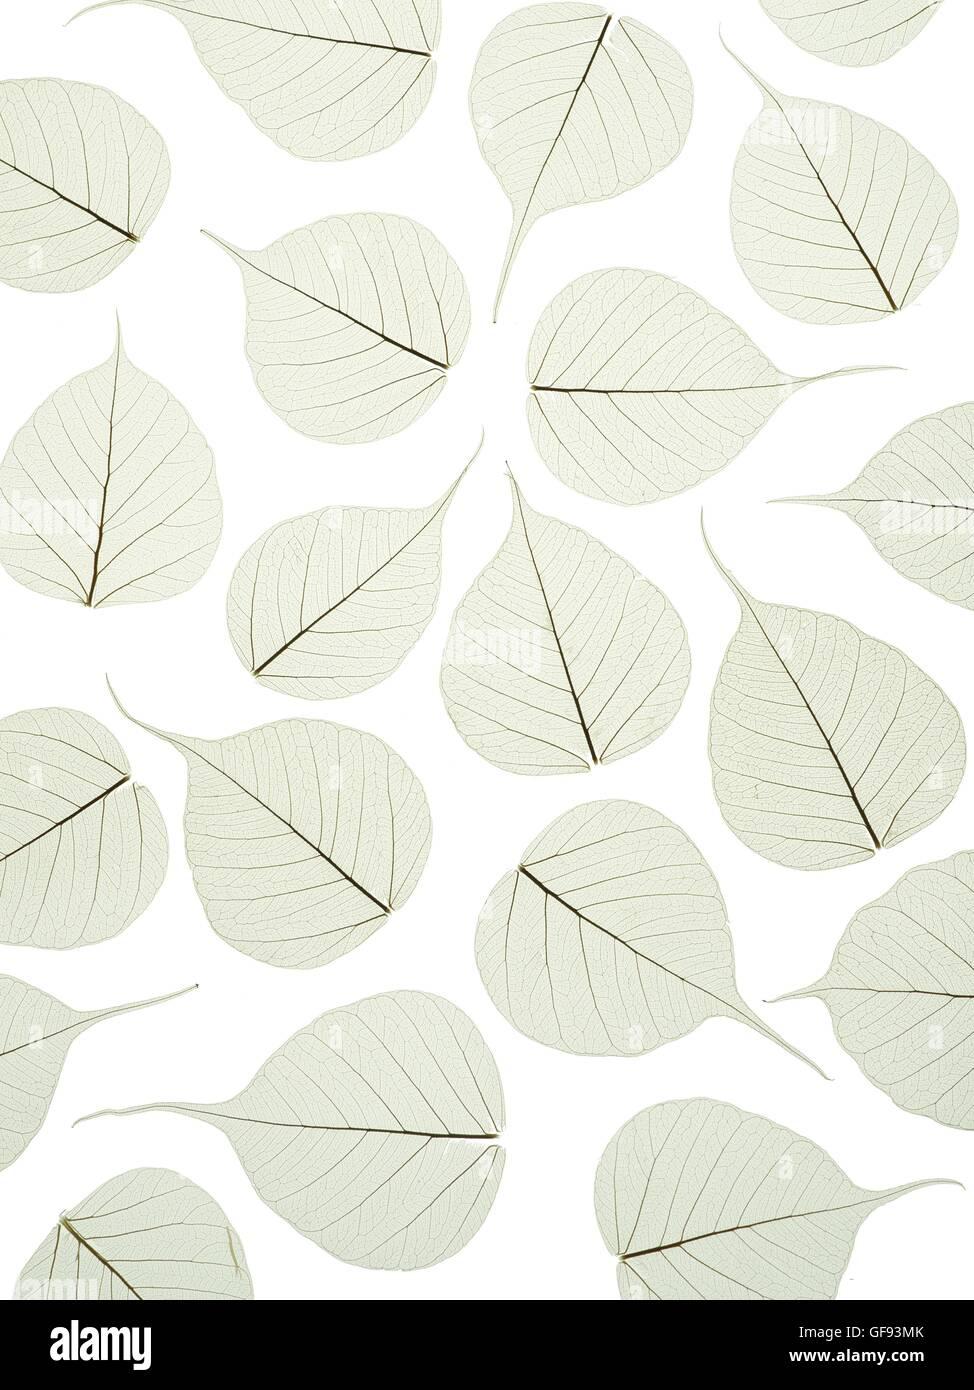 Leaf skeletons of bodhi tree (Ficus religiosa) leaves, studio shot. - Stock Image